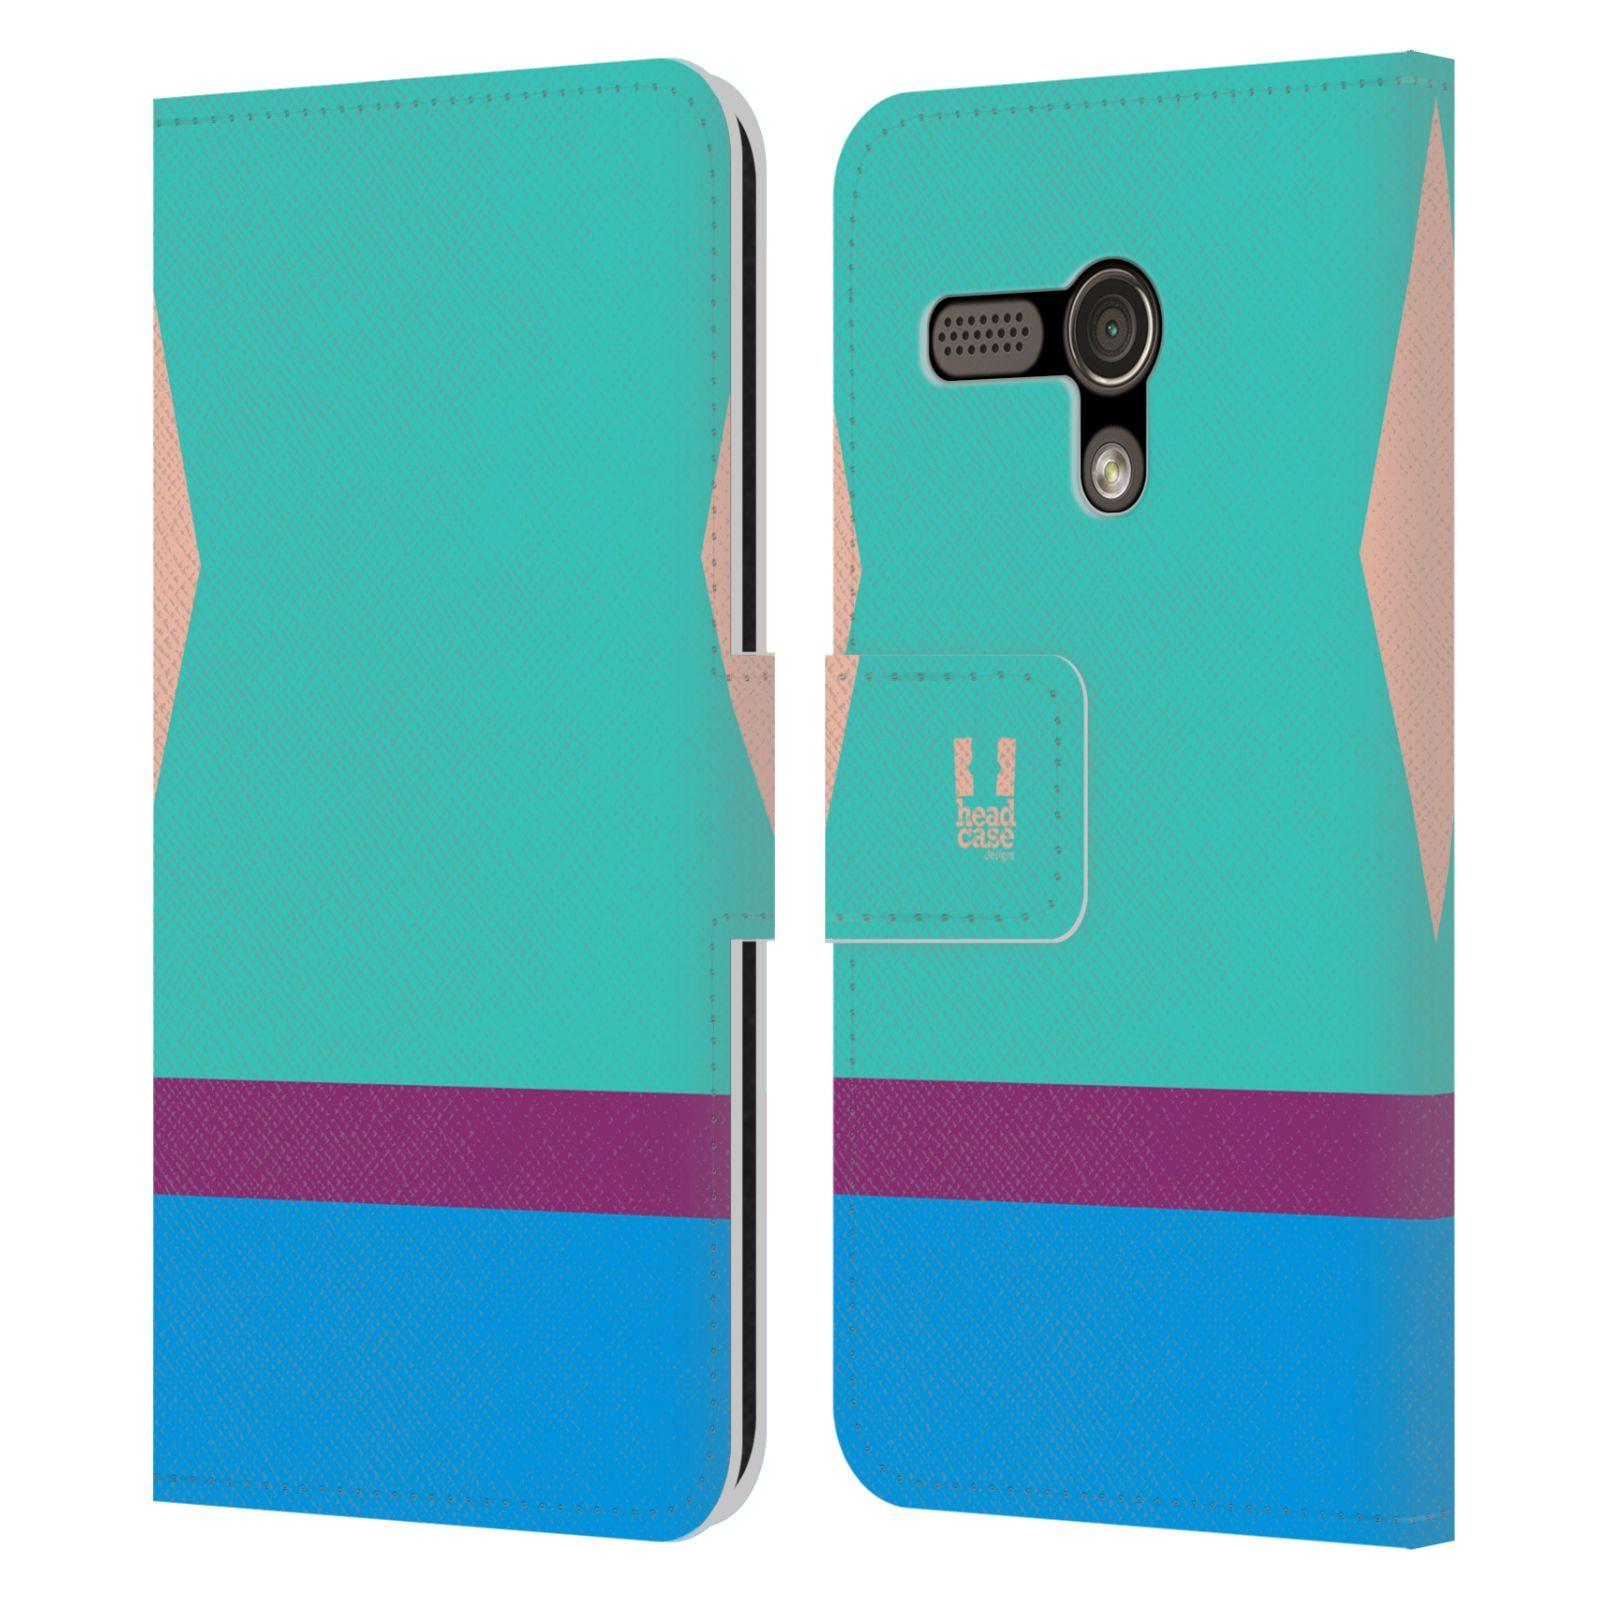 HEAD CASE Flipové pouzdro pro mobil Motorola MOTO G barevné tvary modrá a fialový pruh